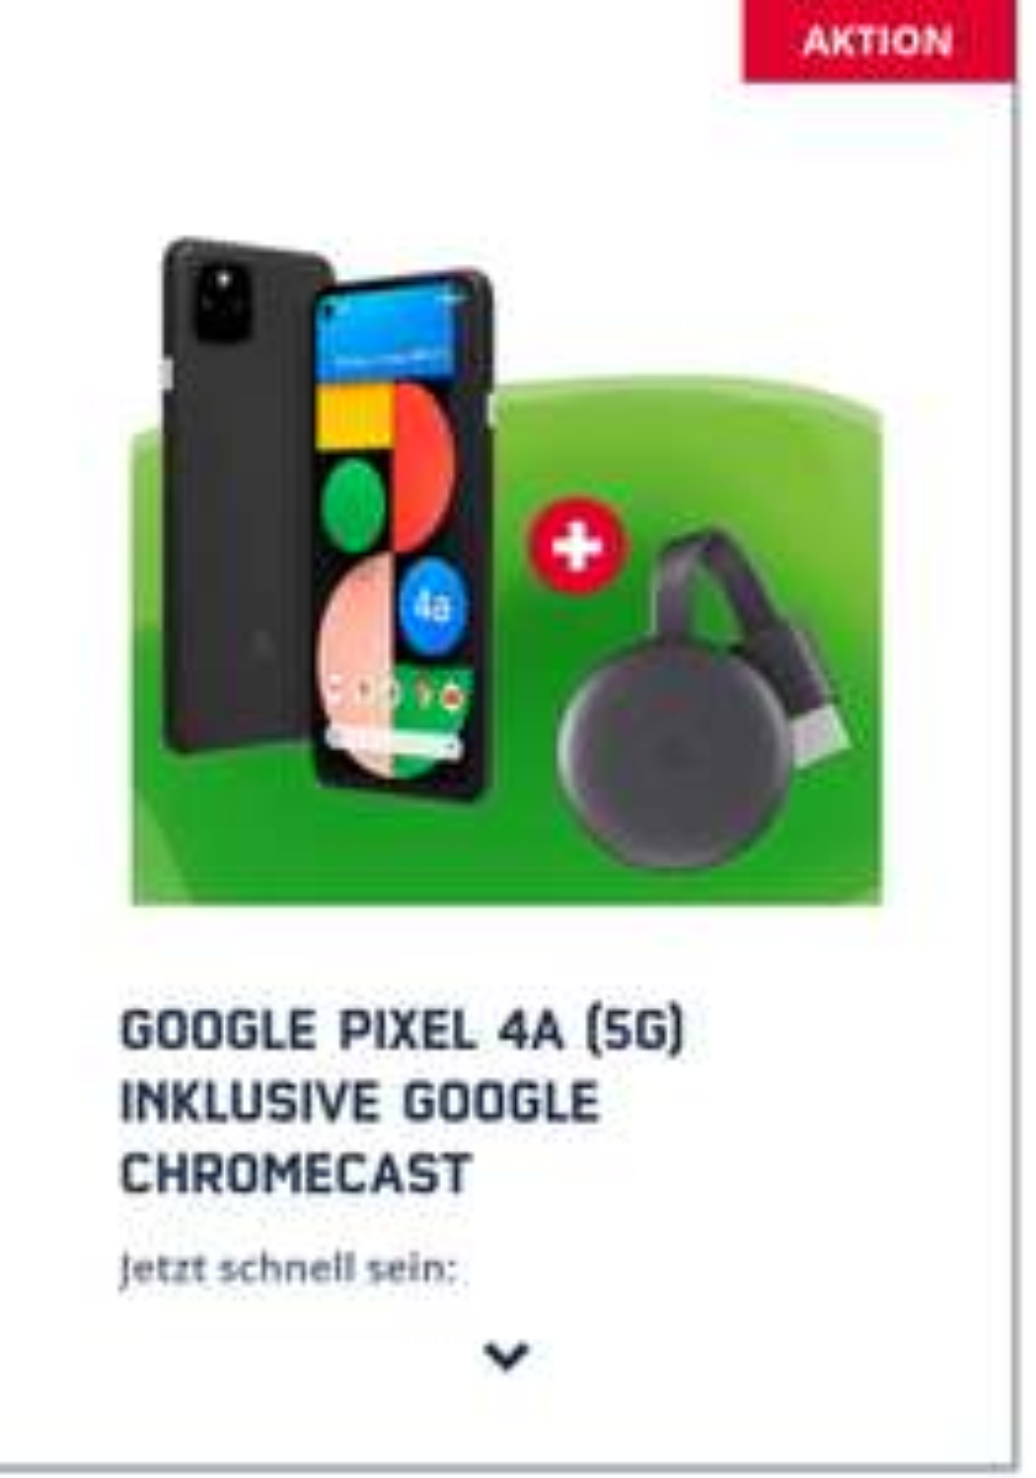 Google Pixel 4a 5g + Google Chromecast 3